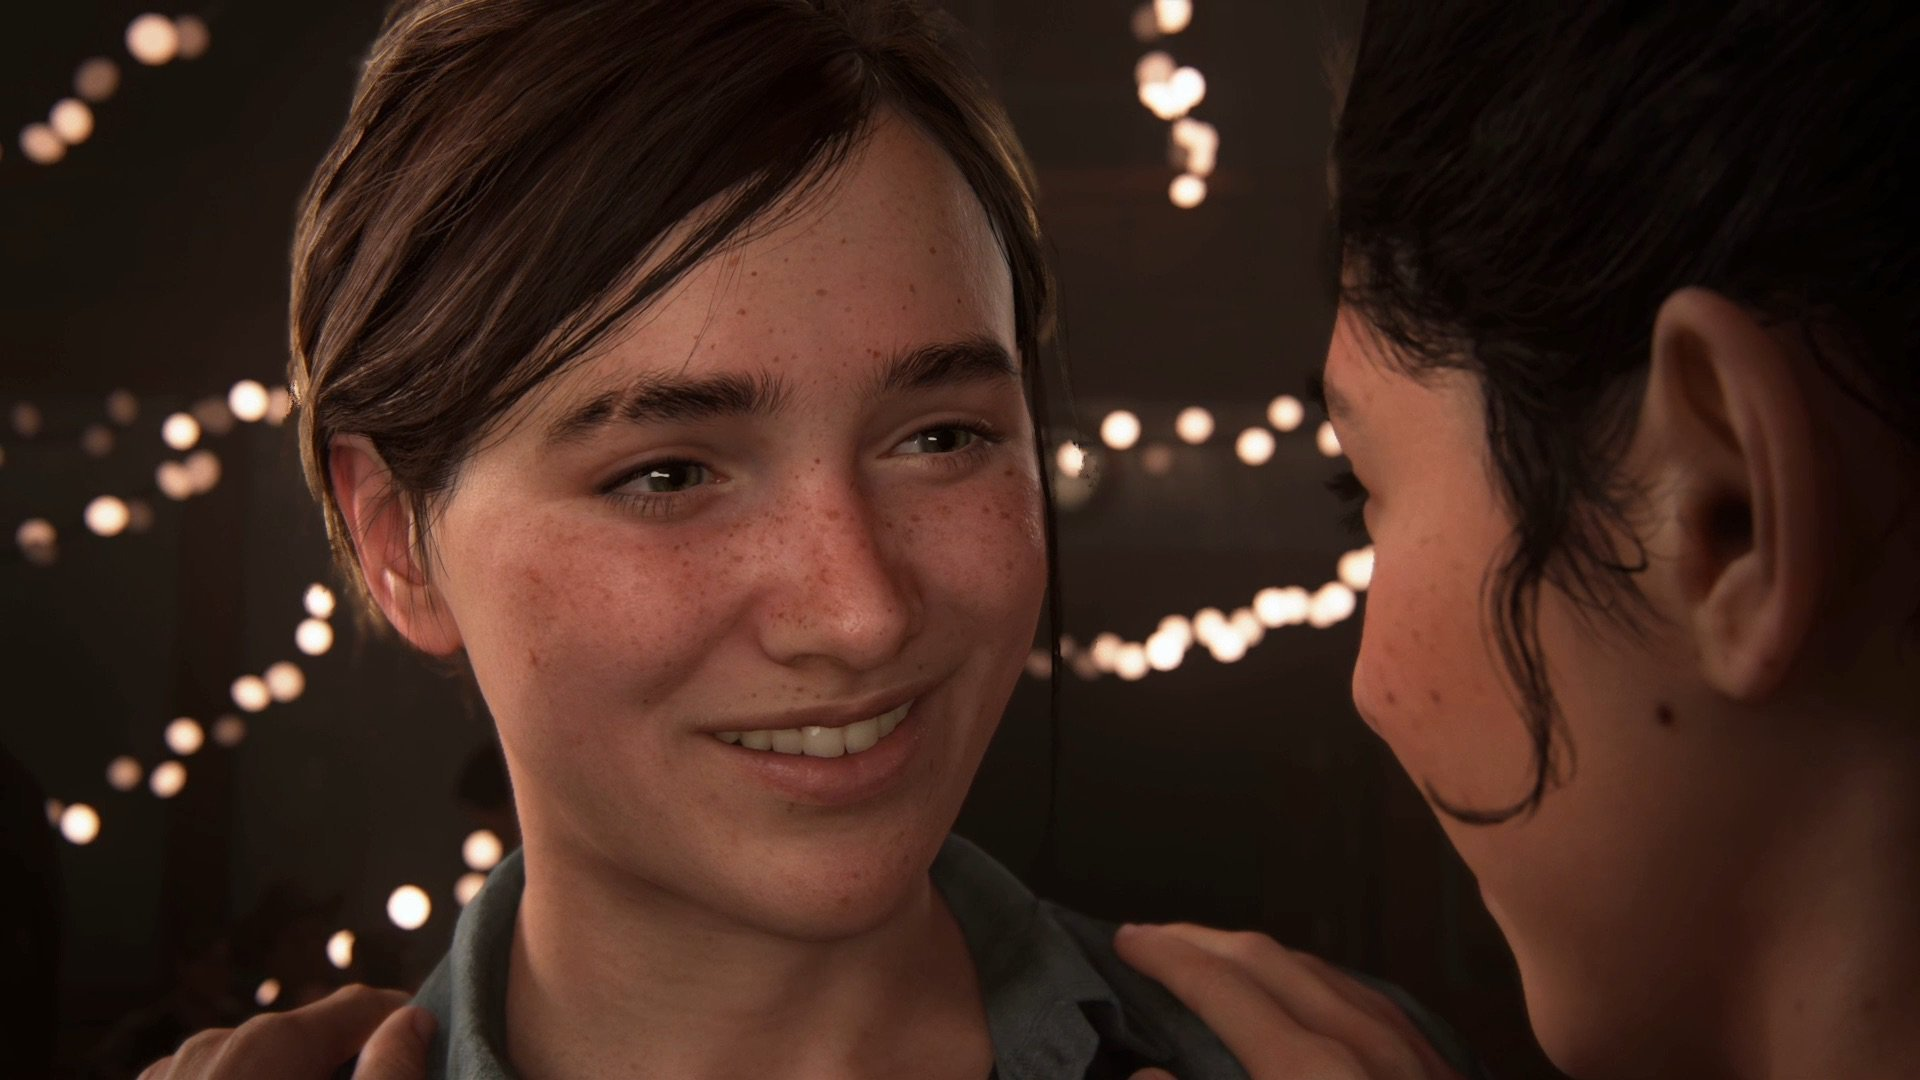 Last of Us 2 details coming soon